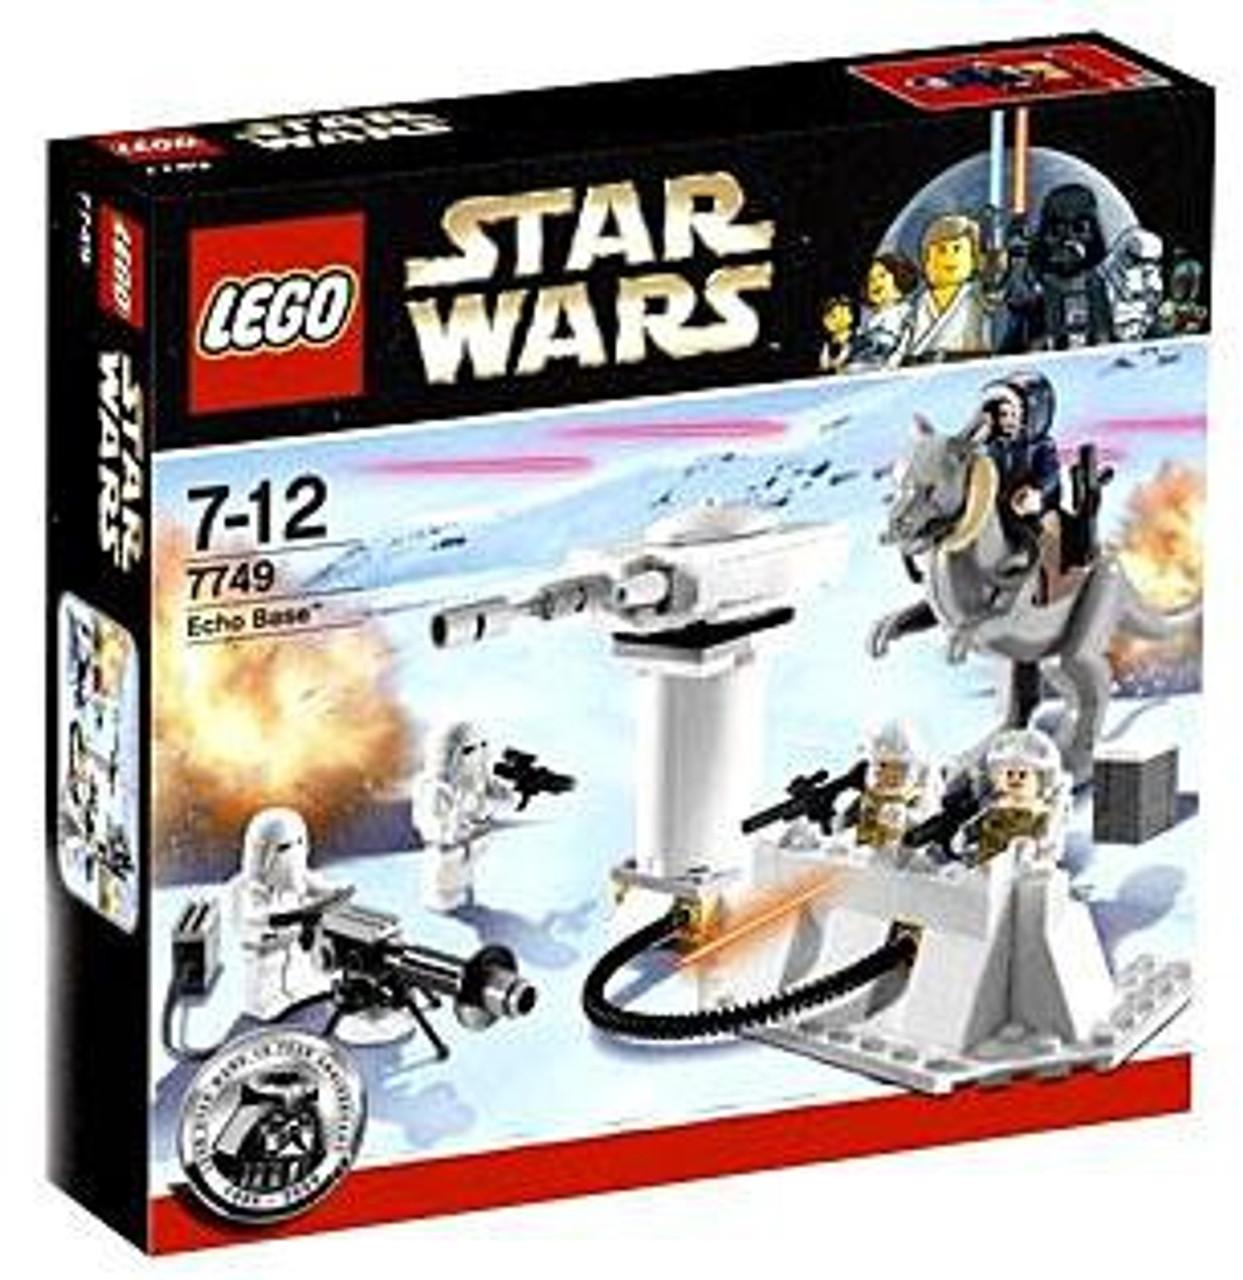 LEGO Star Wars Empire Strikes Back Echo Base Set #7749